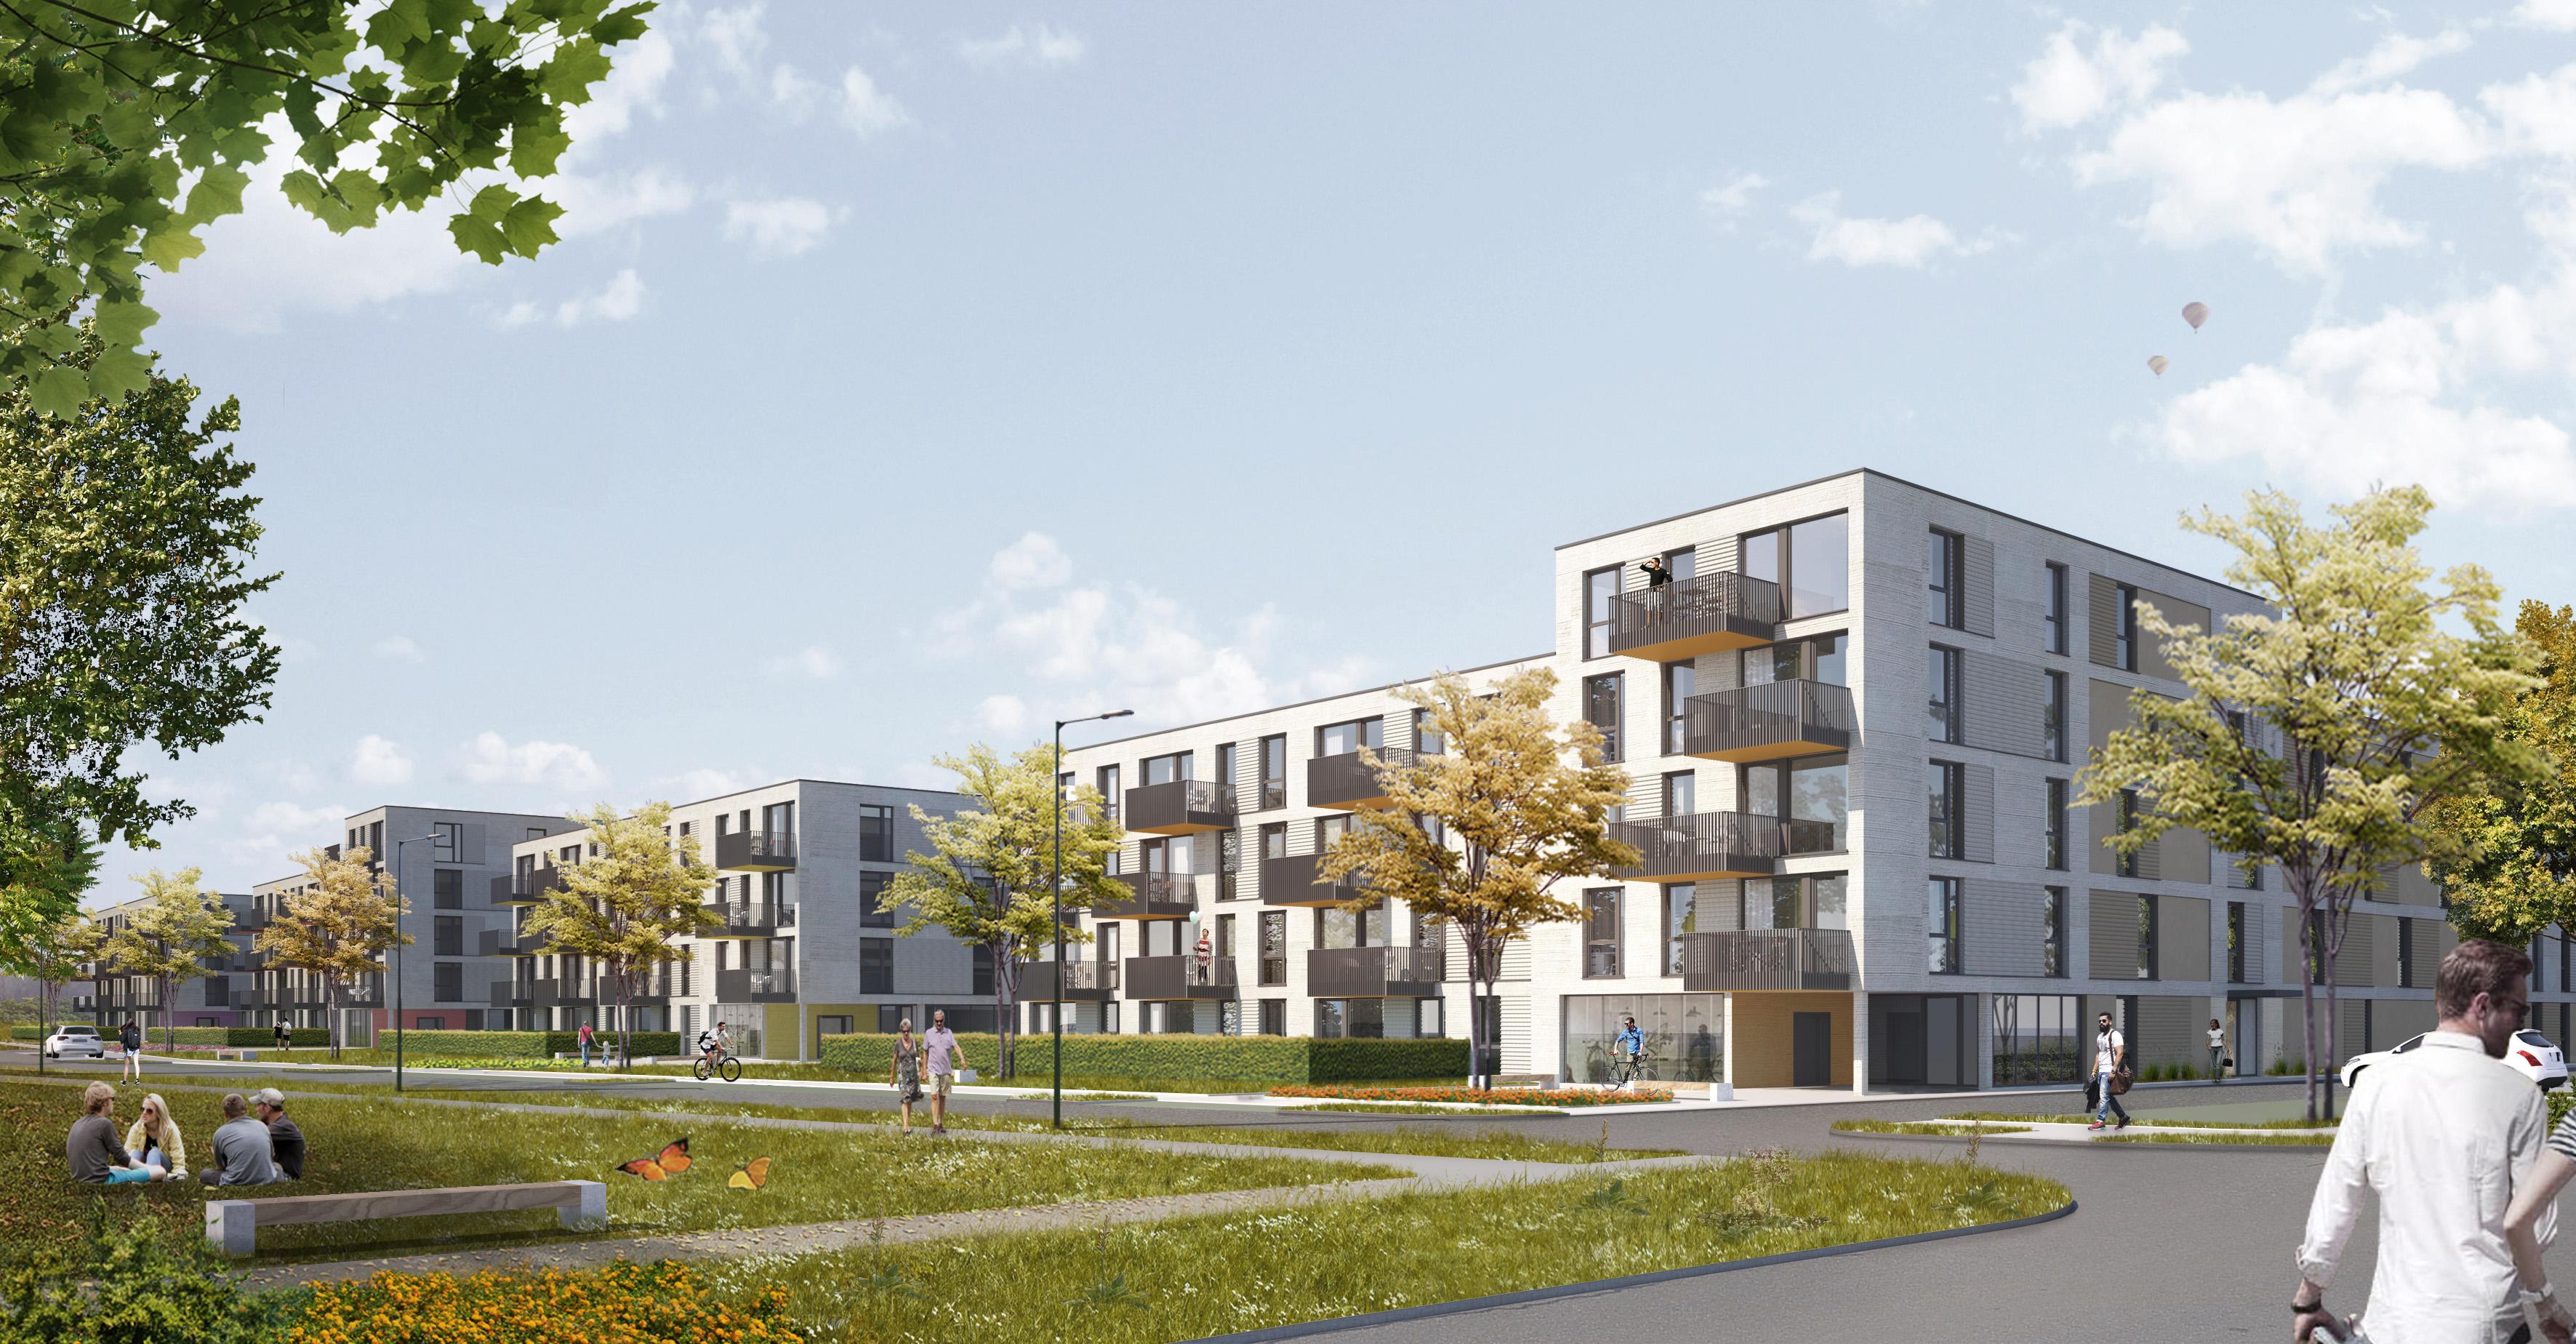 06/WB_Oberfeldstrasse_02.jpg